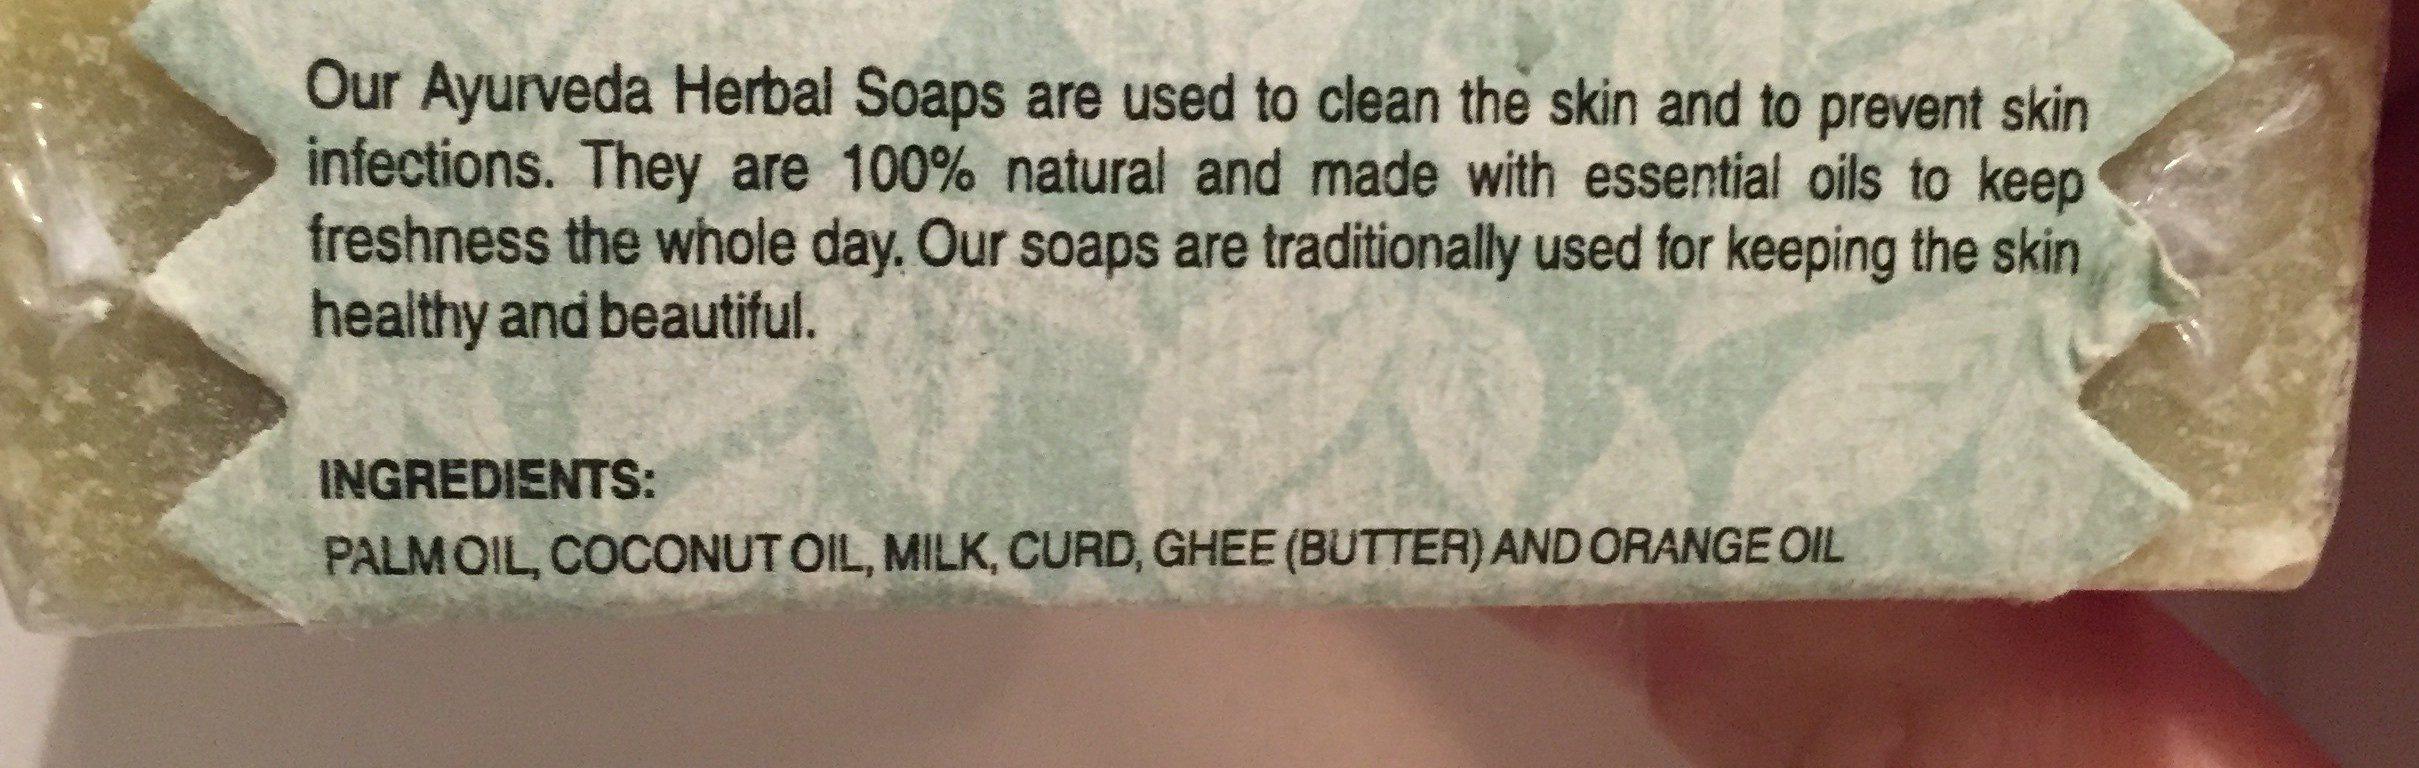 Panchagavya Ayuvedic & Herbal Soap - Ingredients